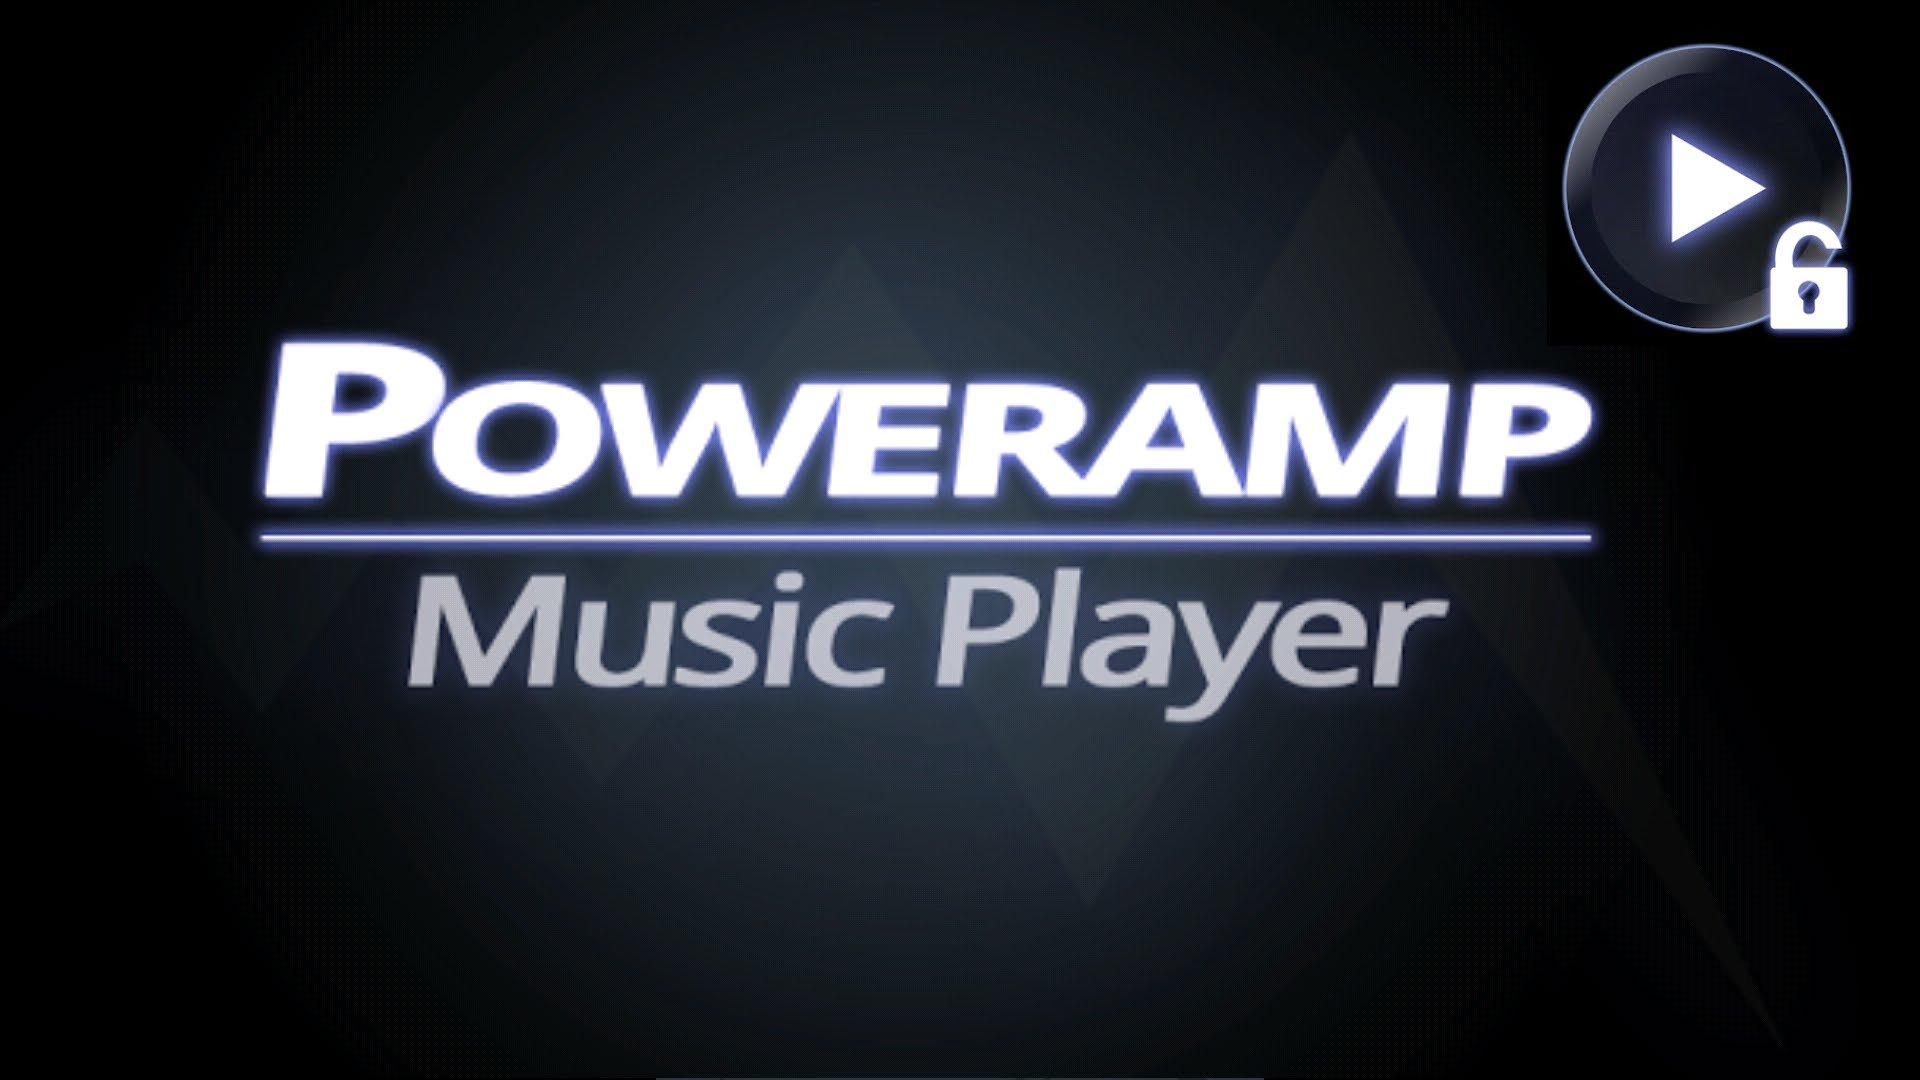 Poweramp Full Version Unlocker에 대한 이미지 검색결과